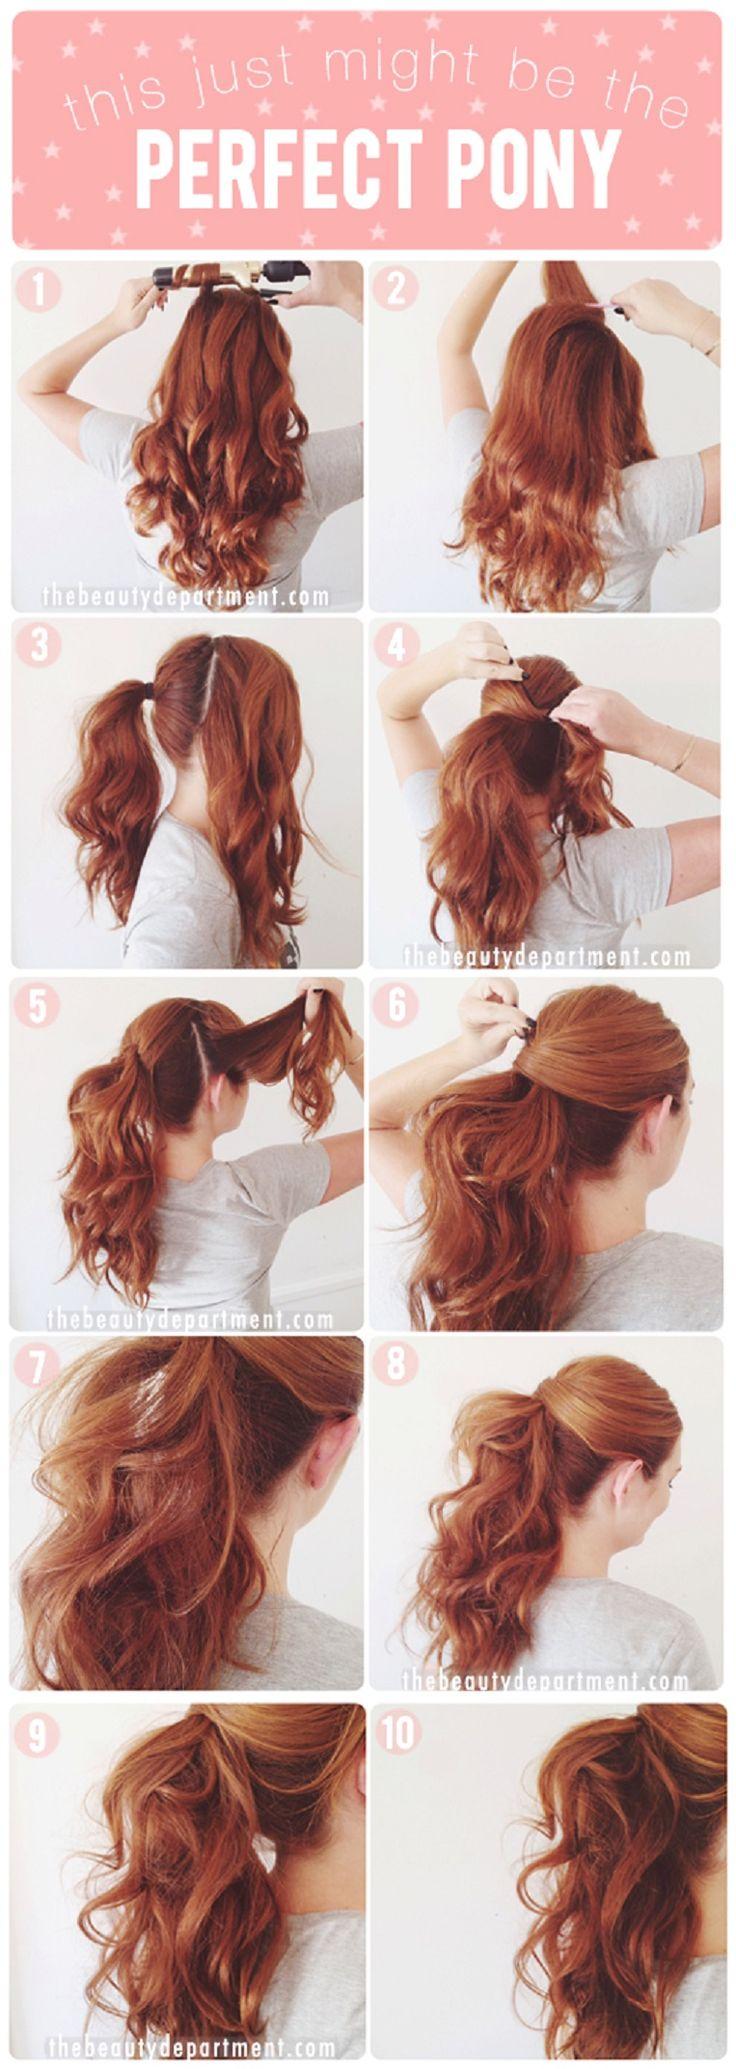 Amazing 1000 Ideas About Cute Ponytail Hairstyles On Pinterest Cute Short Hairstyles Gunalazisus